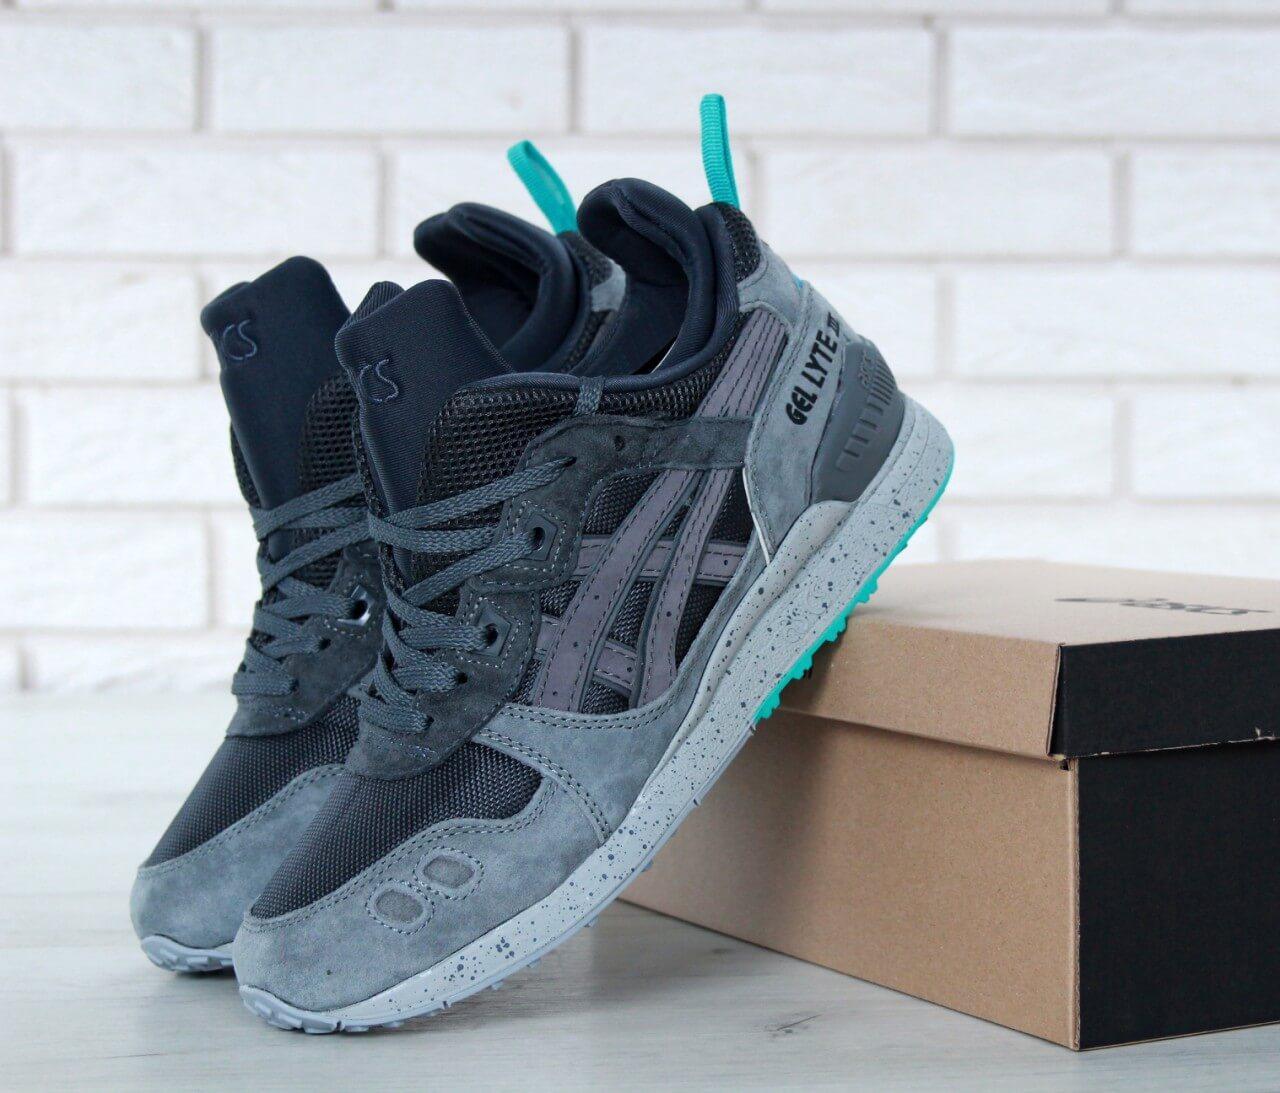 30064f13cd7941 Кроссовки Asics Gel Lyte III Mid Tops Grey Transforms - Интернет магазин  обуви «im-